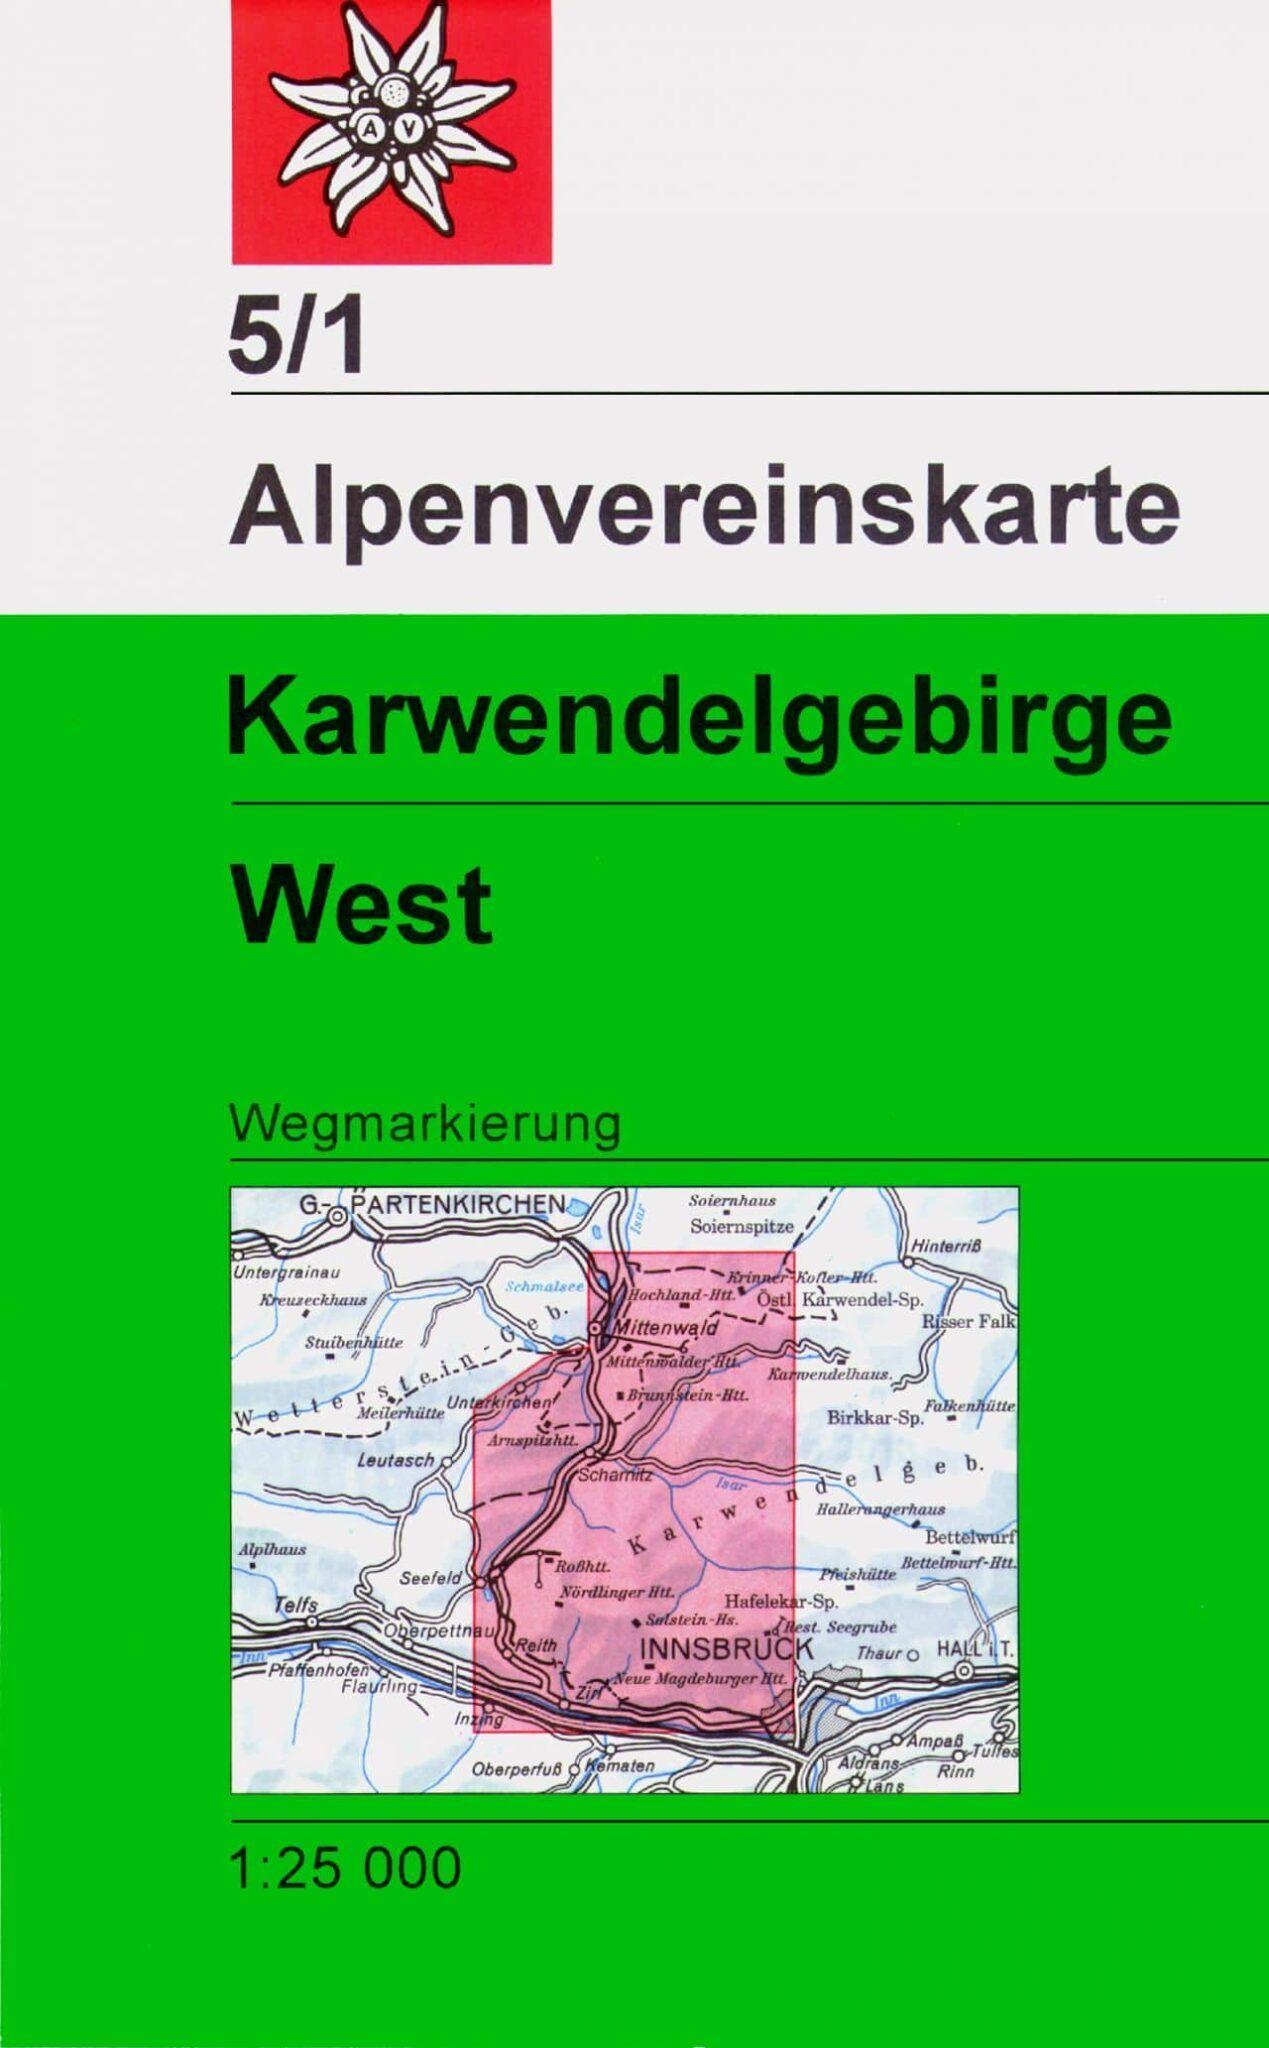 Maps and books - Karwendel Höhenweg Tirol Innsbruck Map Offline on basel switzerland map, bastia map, yonah mountain map, europe map, salzburg map, altaussee map, graz airport map, ljubljana map, vienna map, temuco map, trieste map, austria map, beqa map, kaliningrad map, obertraun map, alps map, hallstatt map, faaa map, sarajevo map, djanet map,